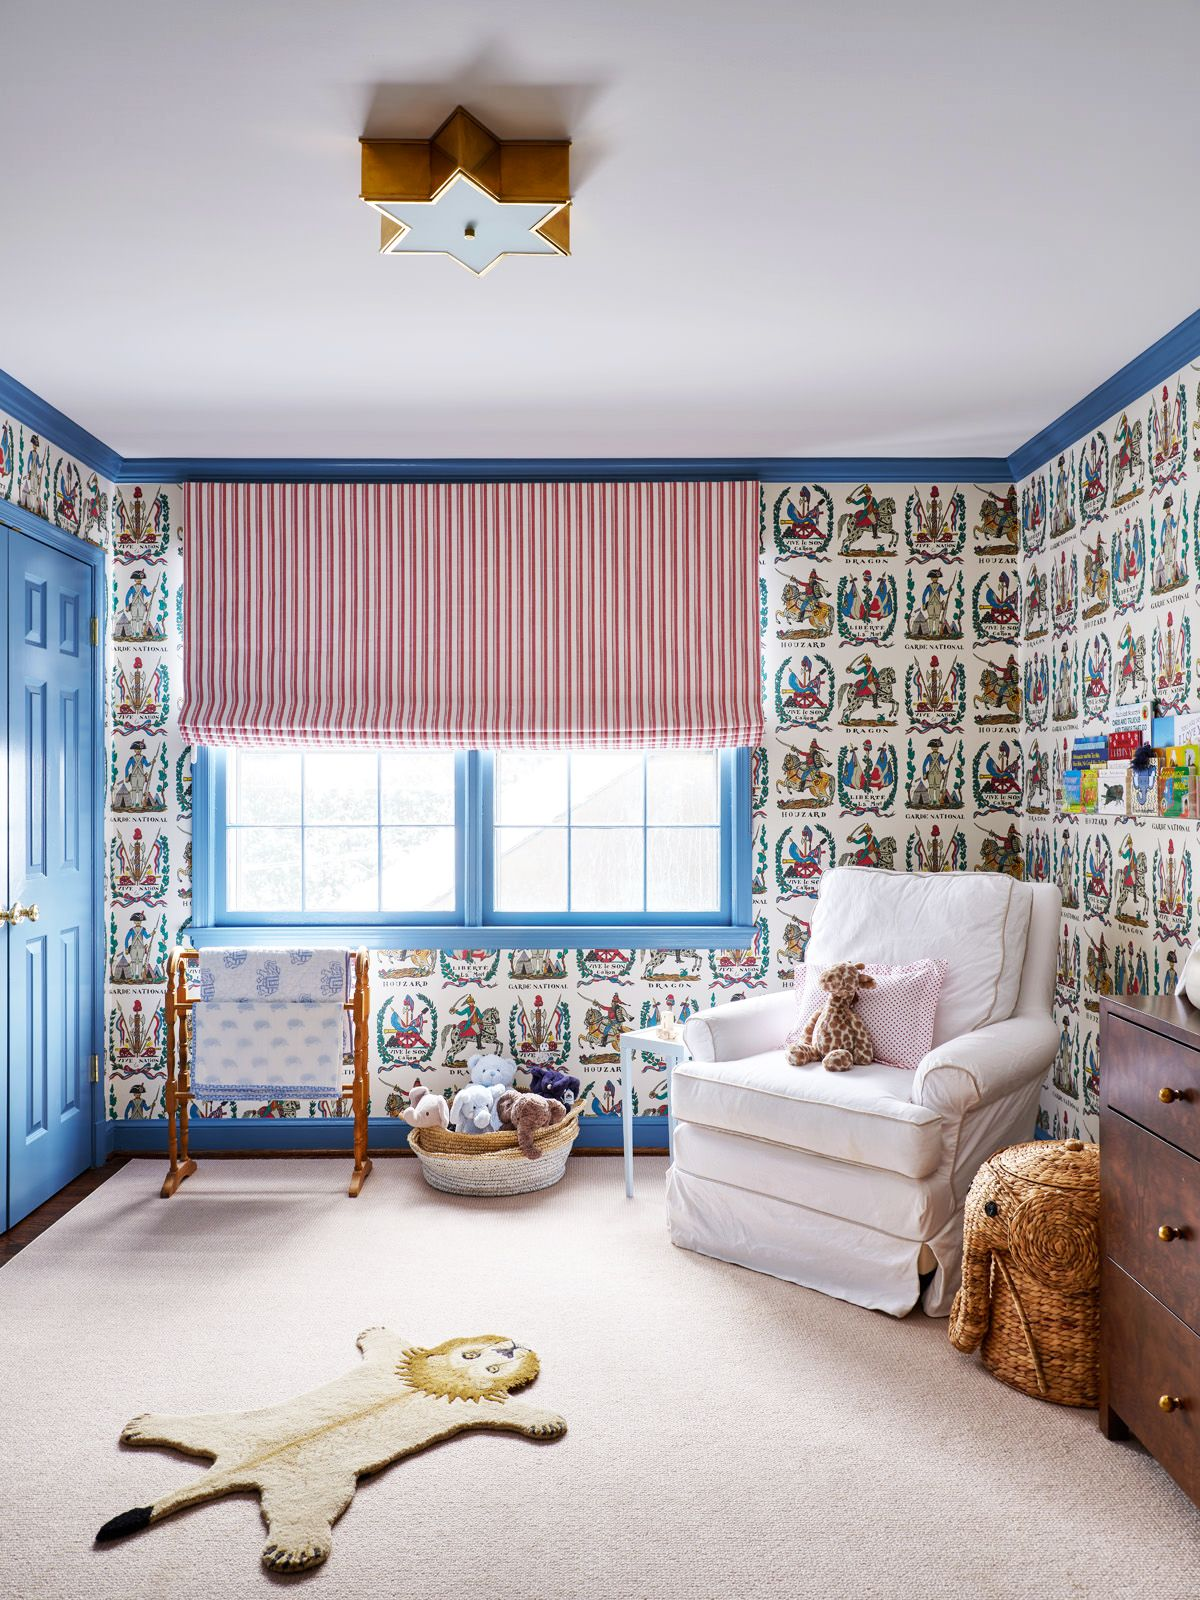 17 Cute Baby Nursery Storage Ideas And